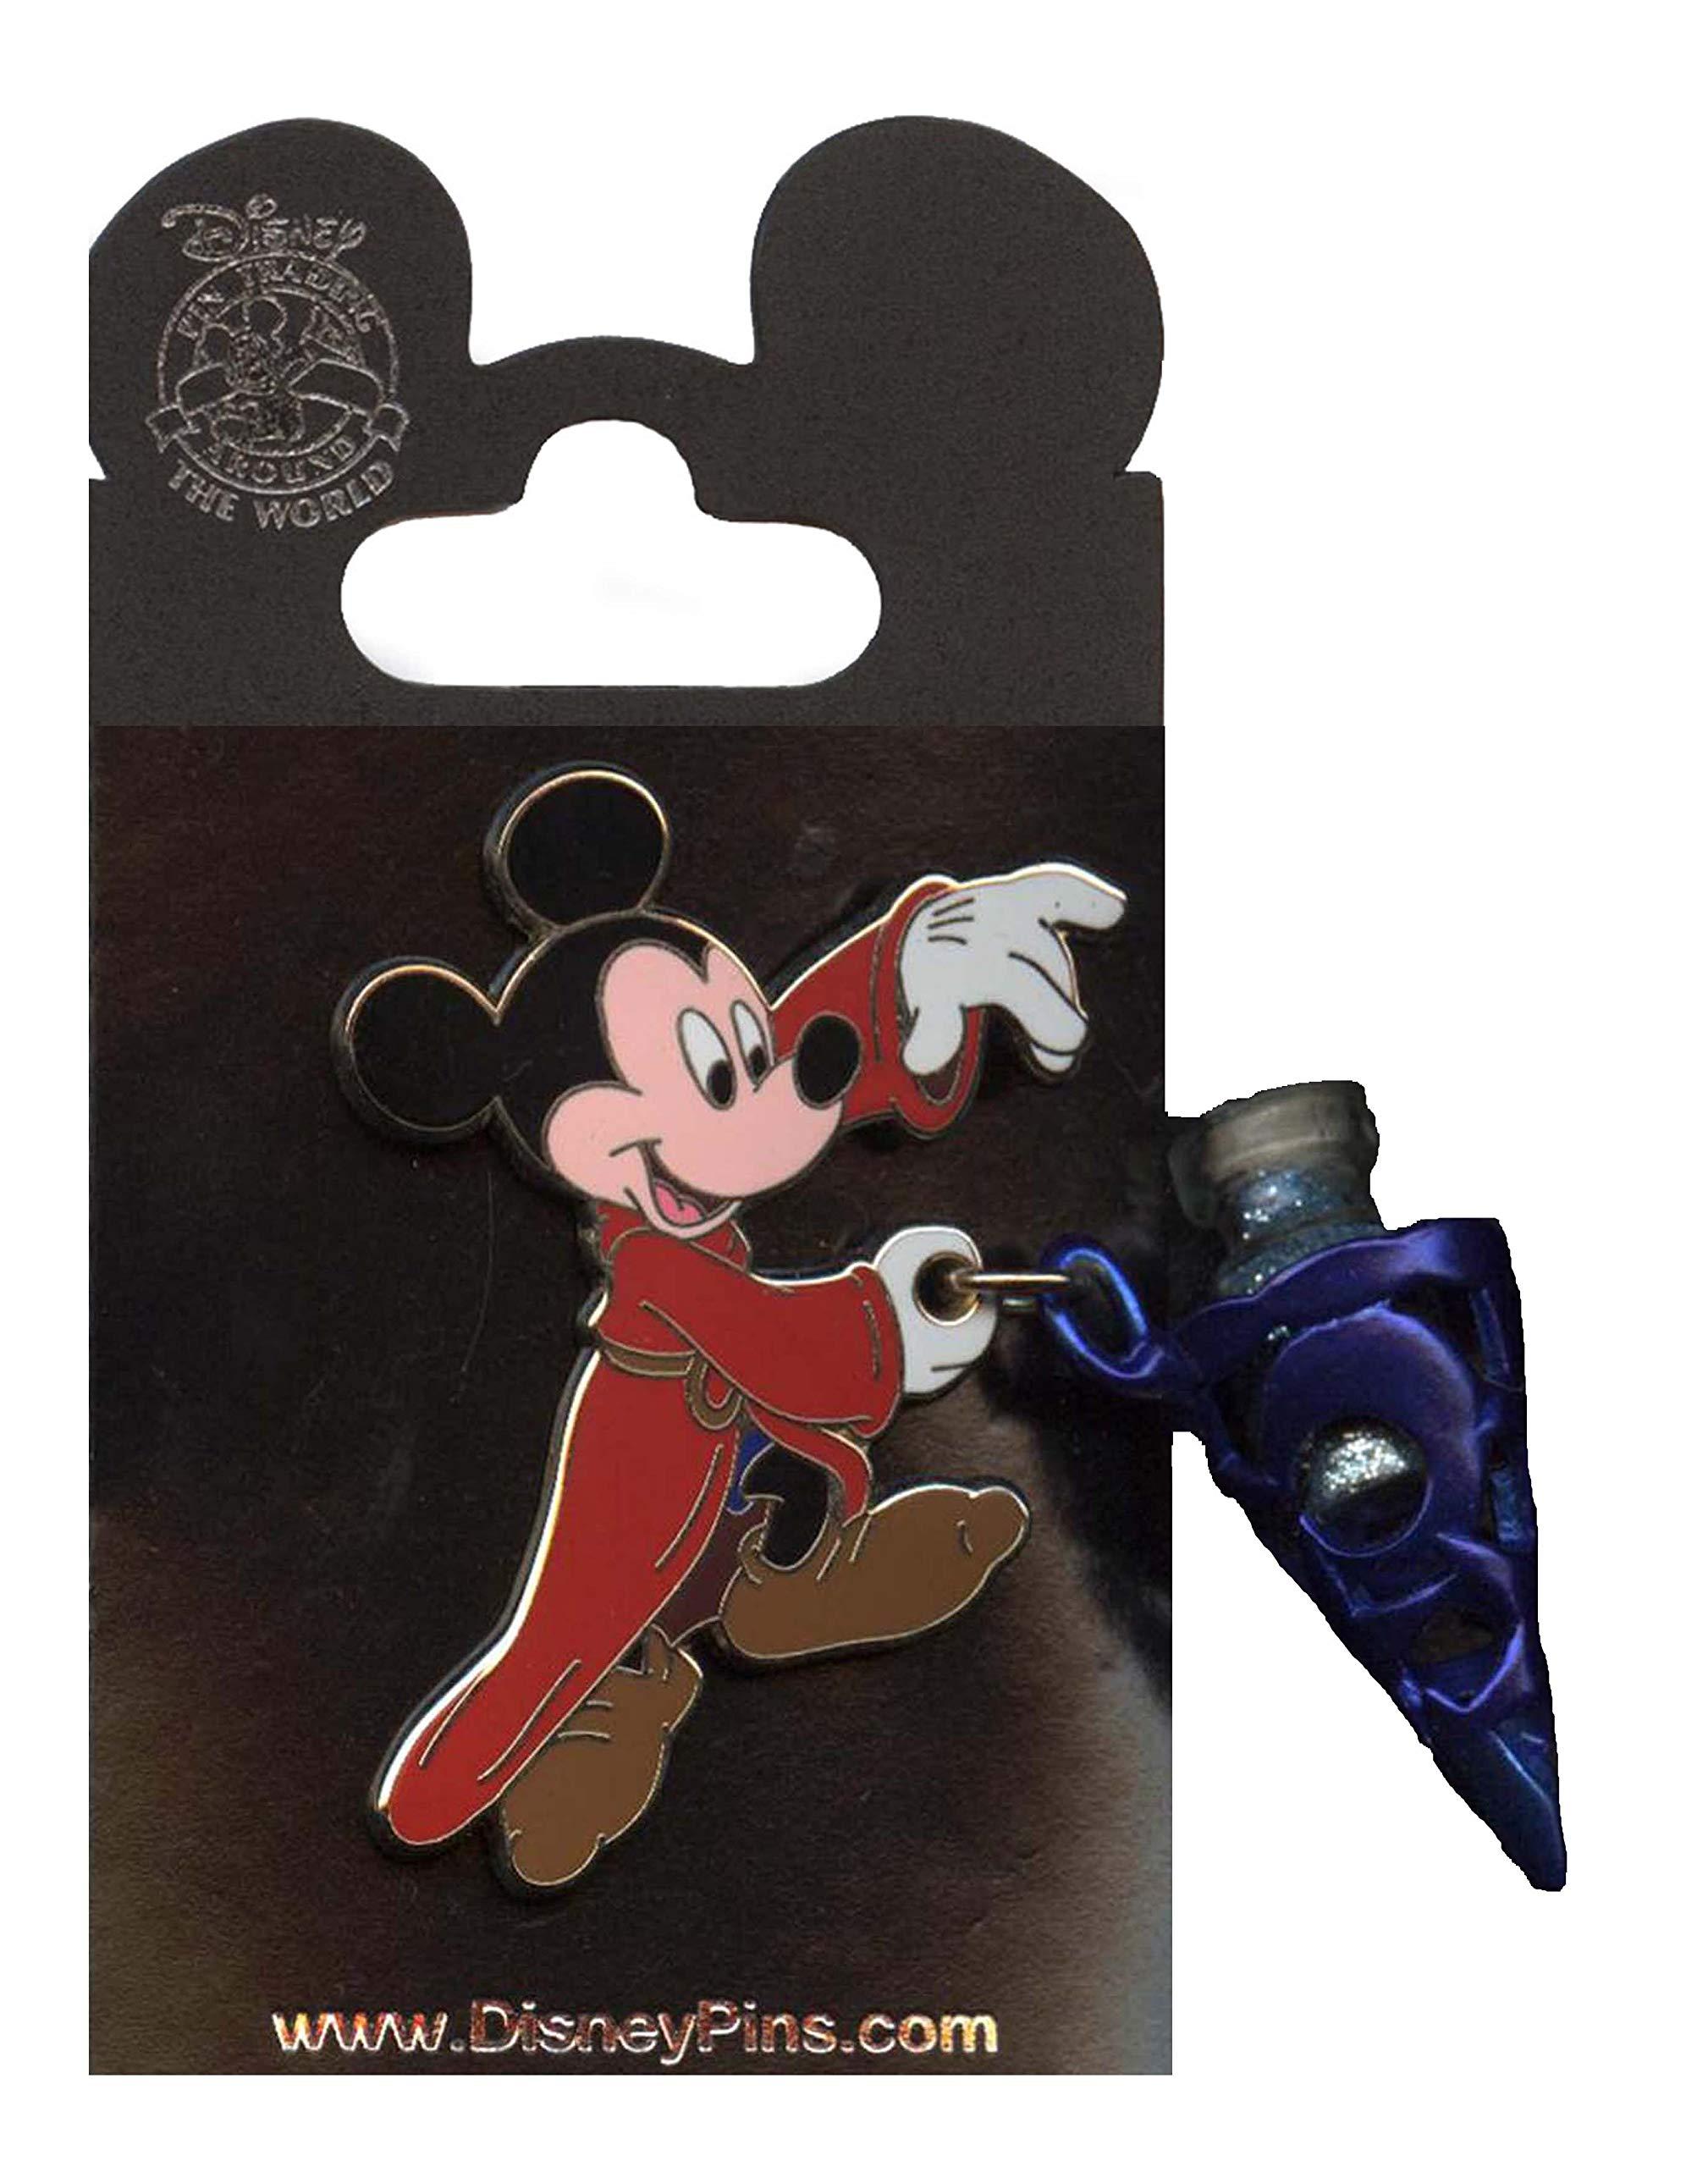 Disney Pin - Sorcerer Mickey - Vial of Magic Dust - Pin 82587